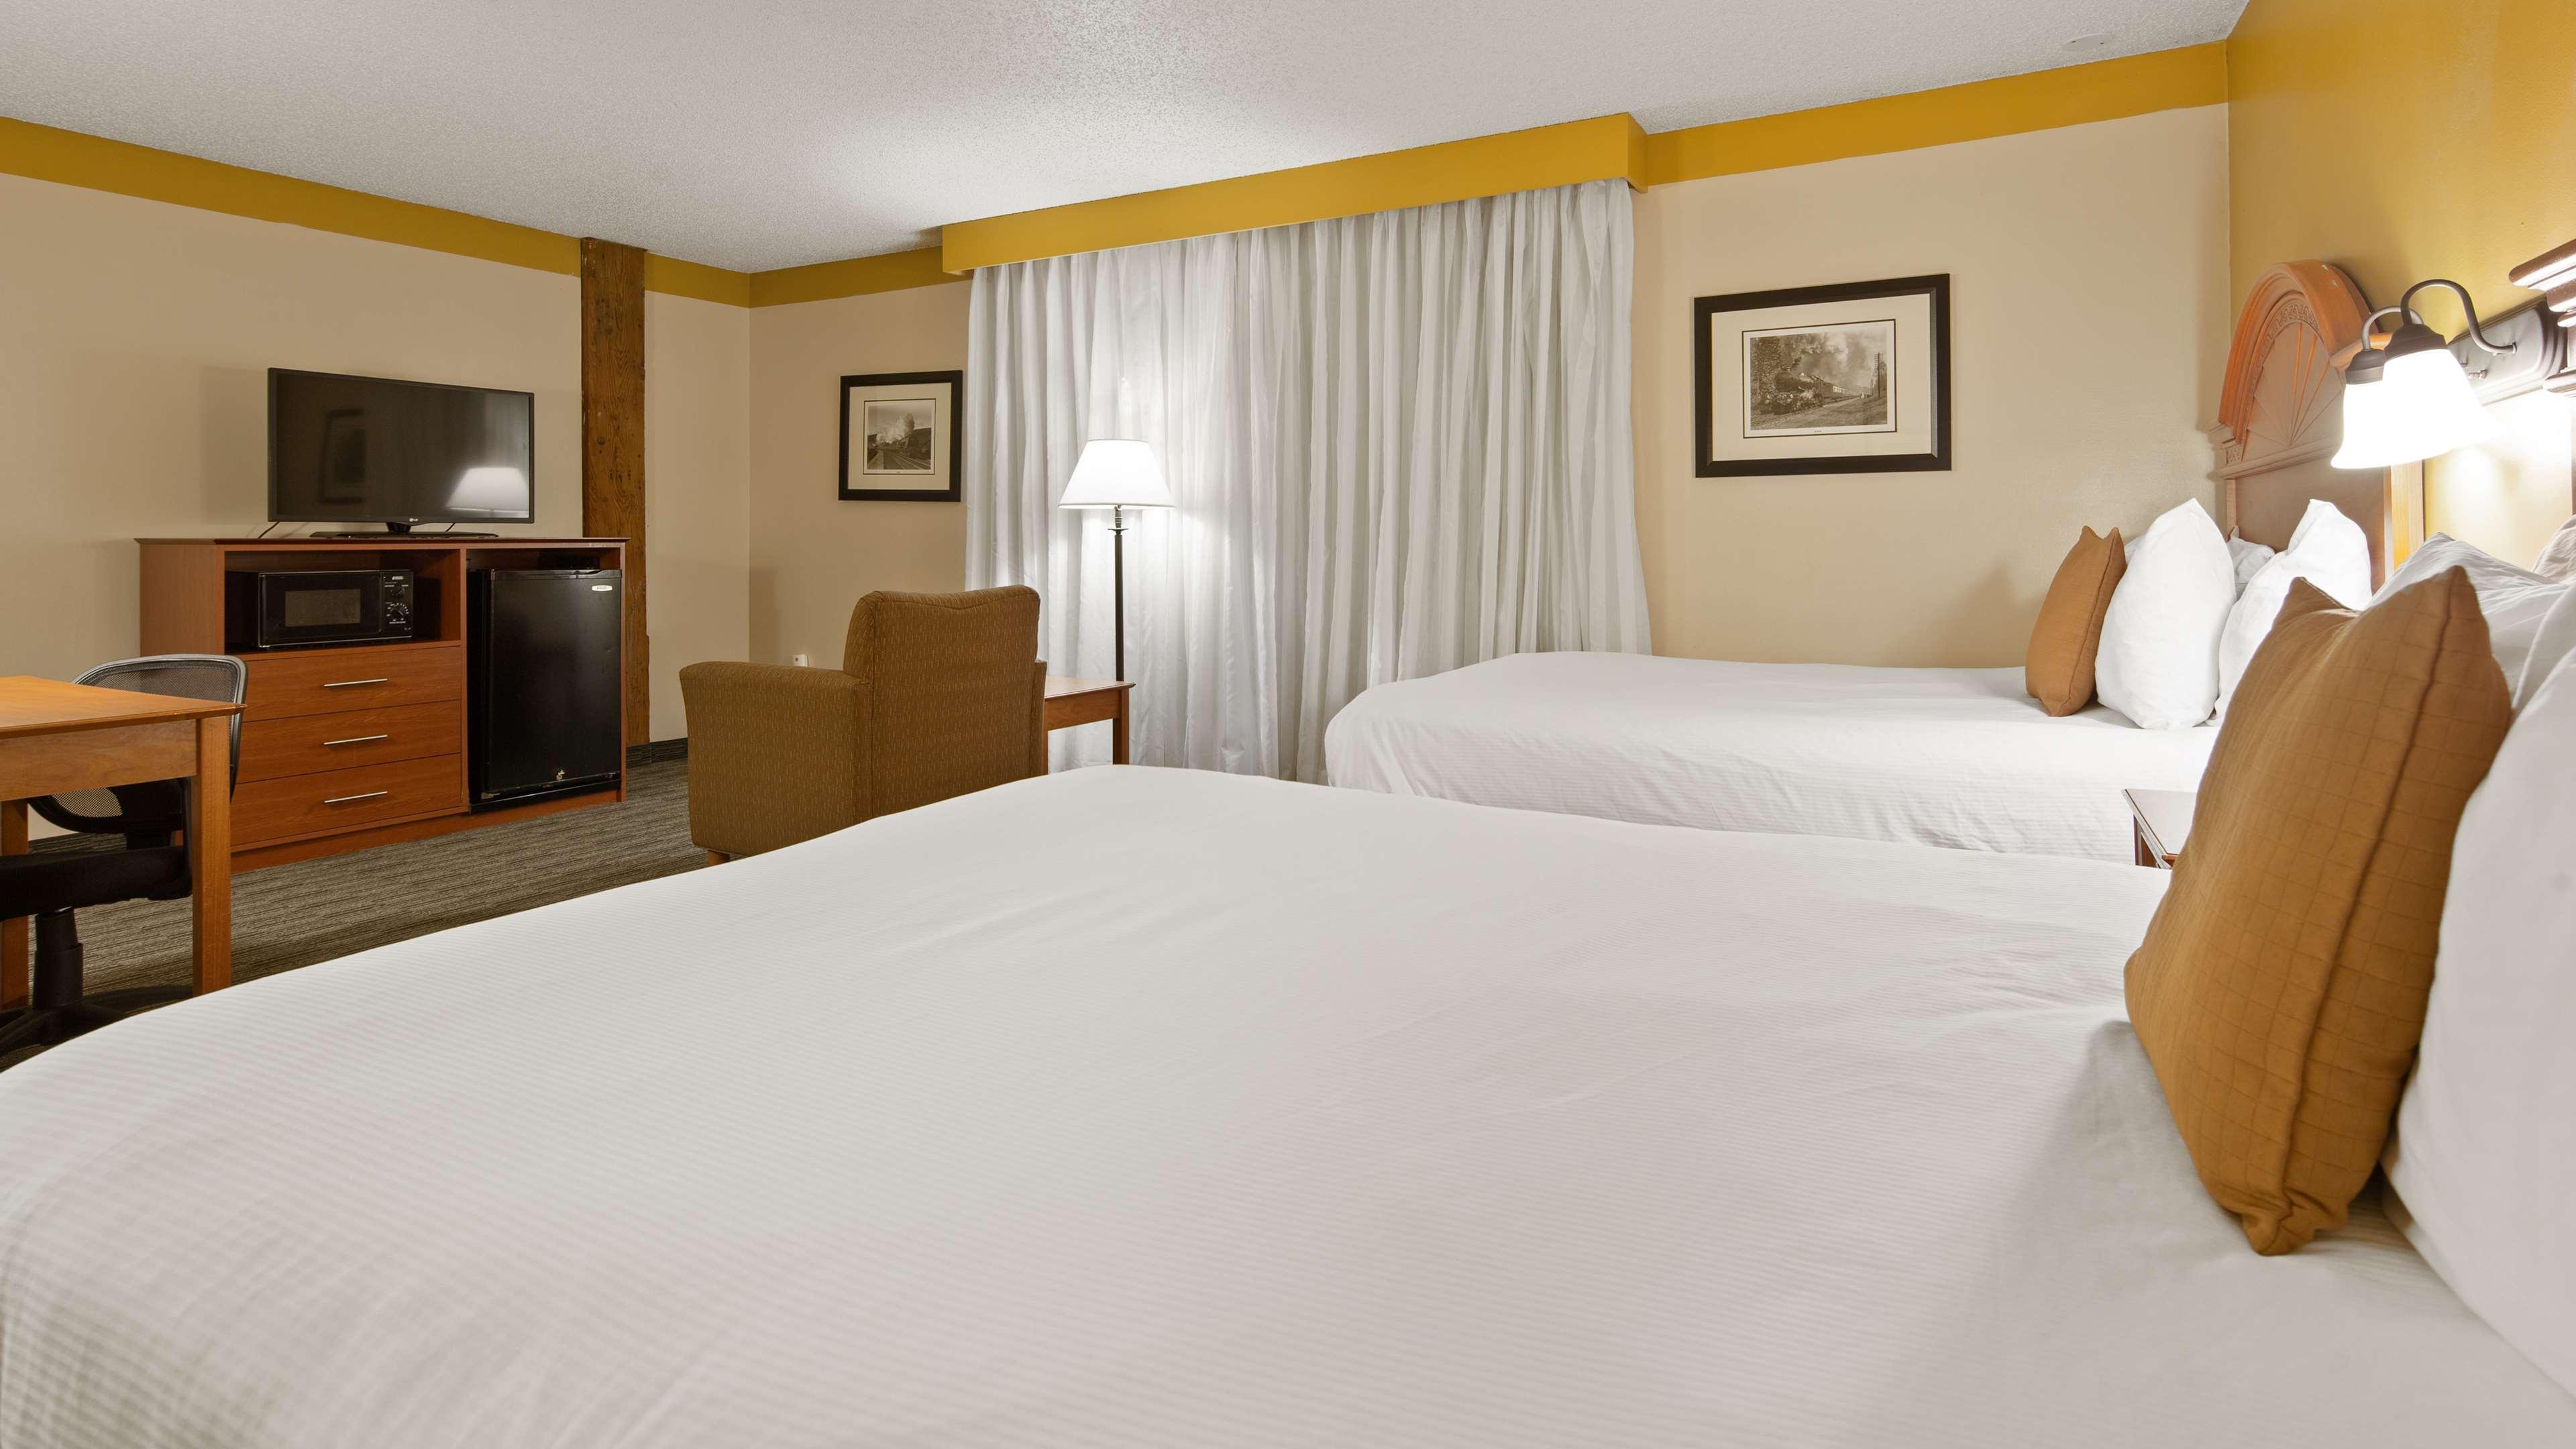 Best Western Plus Como Park Hotel image 15